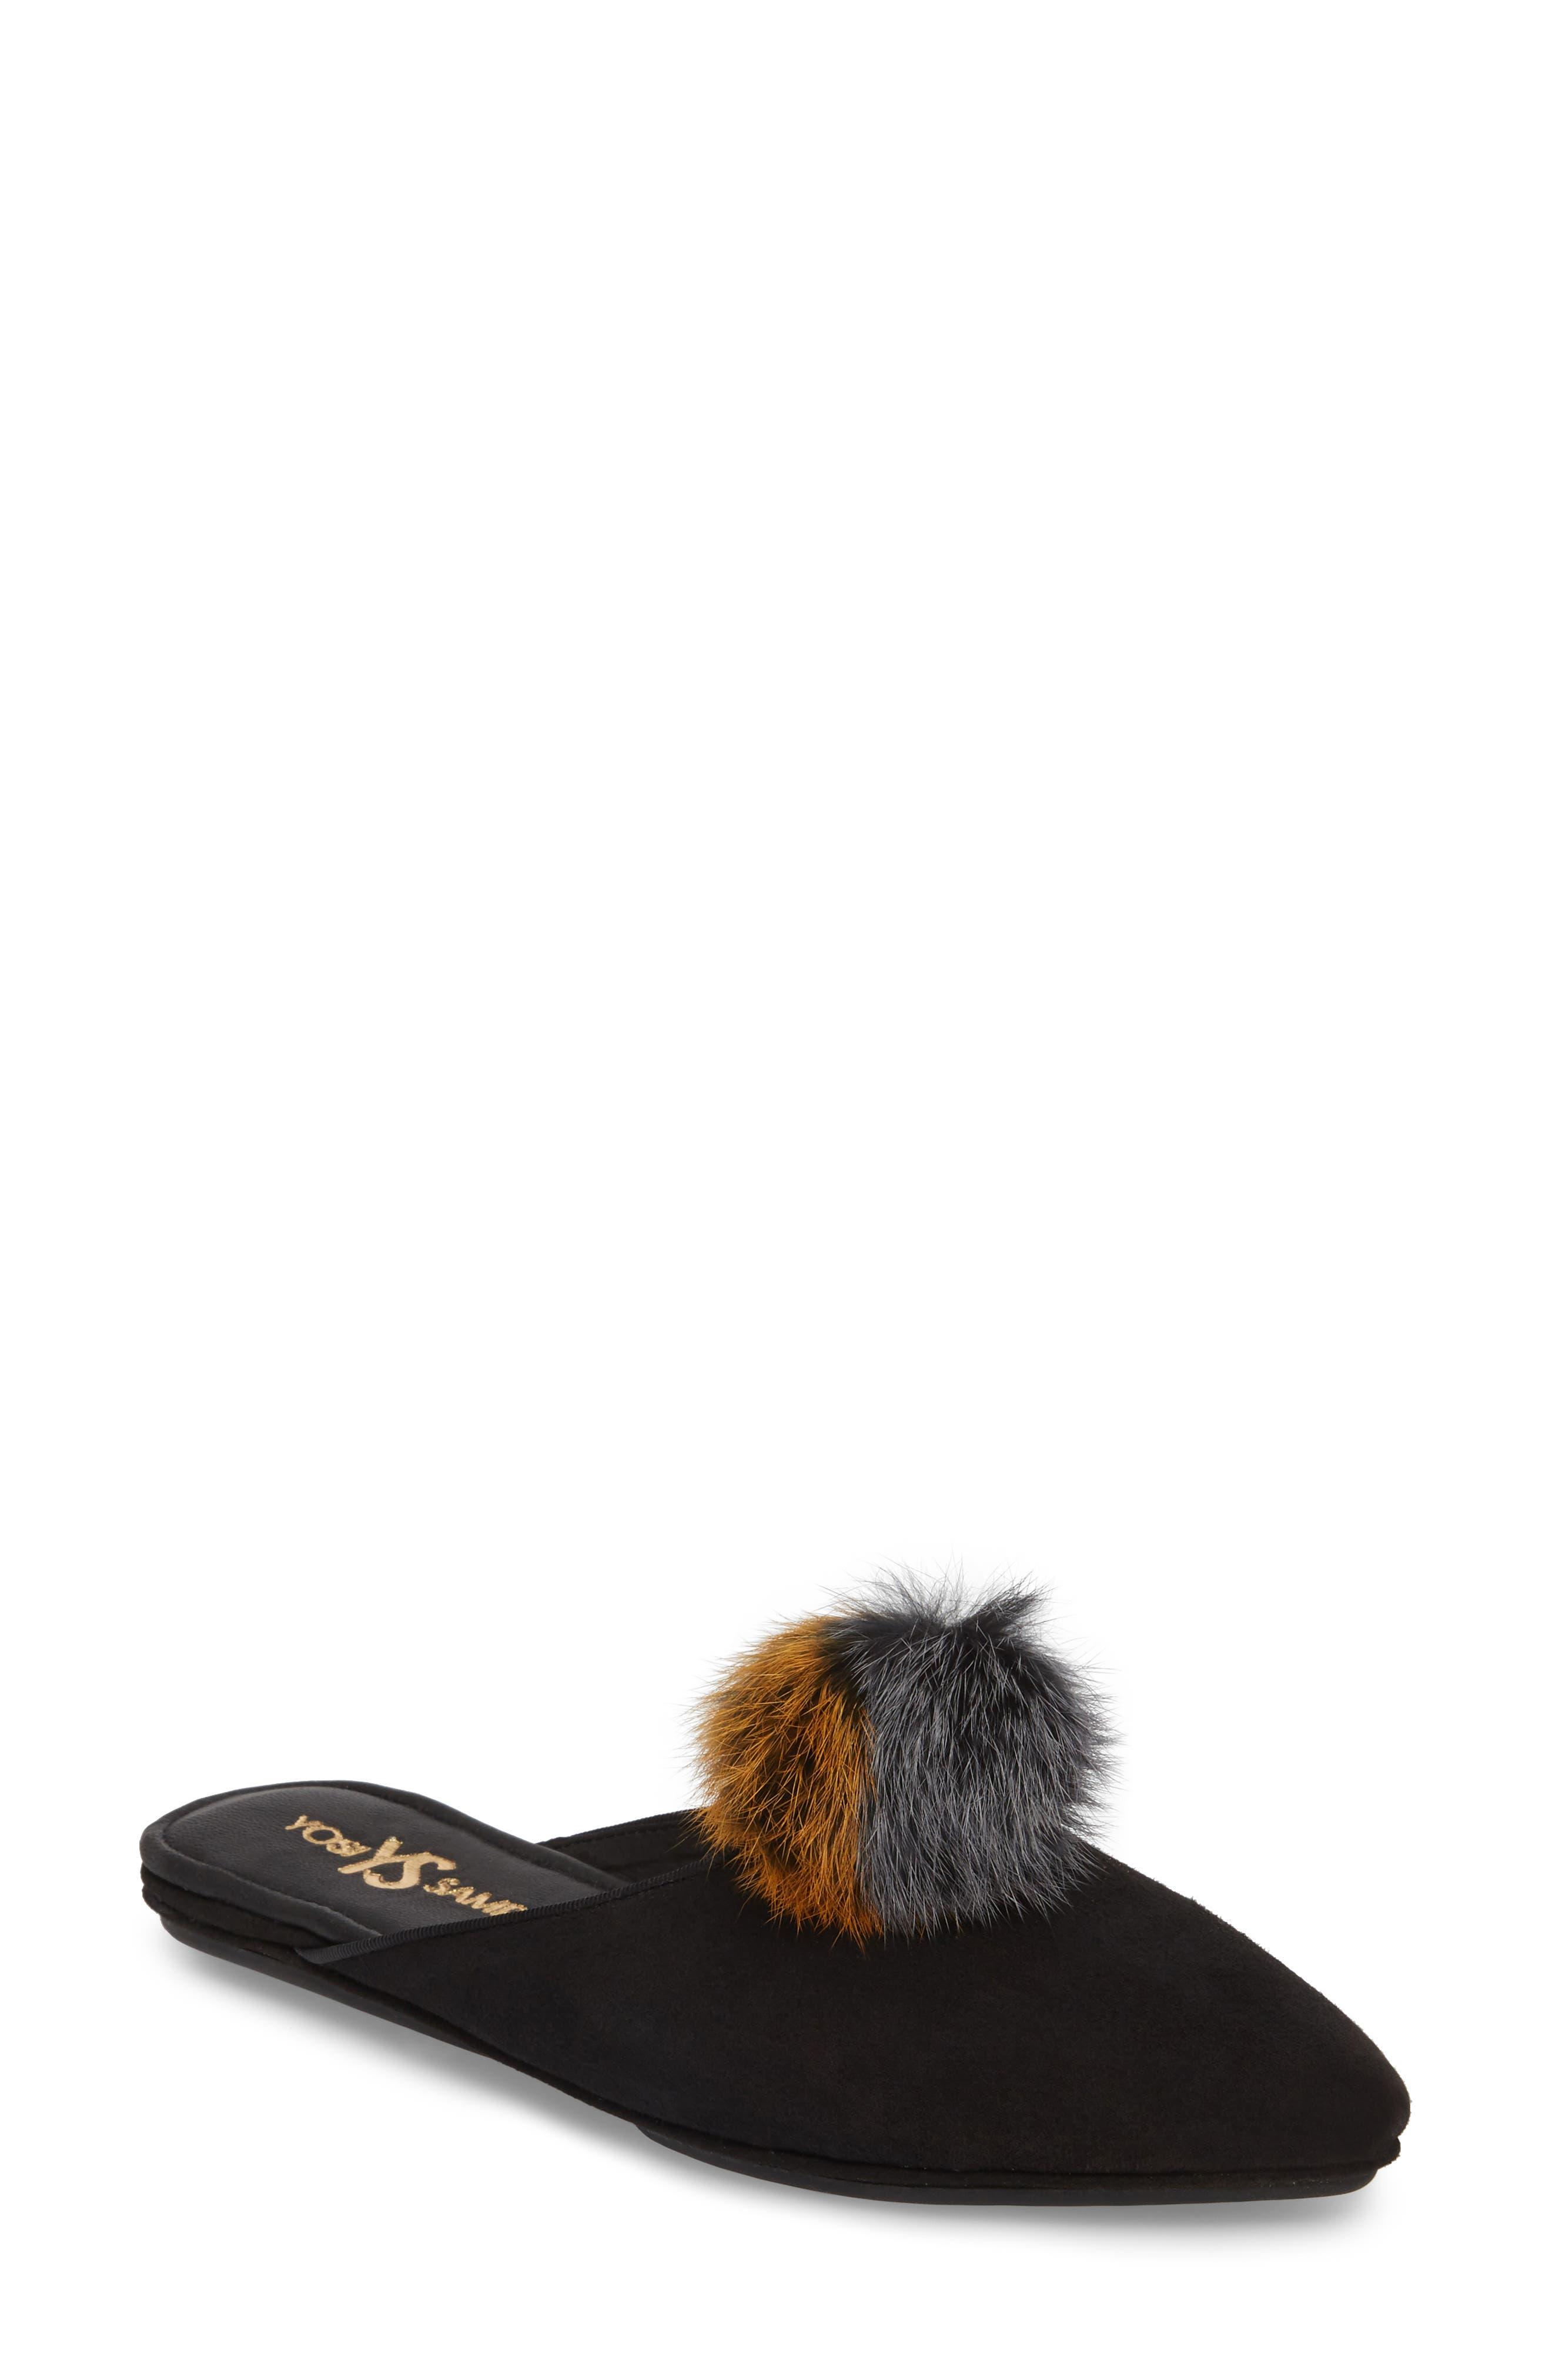 Vidi Genuine Rabbit Fur Loafer Mule,                             Main thumbnail 1, color,                             Black Rabbit Fur